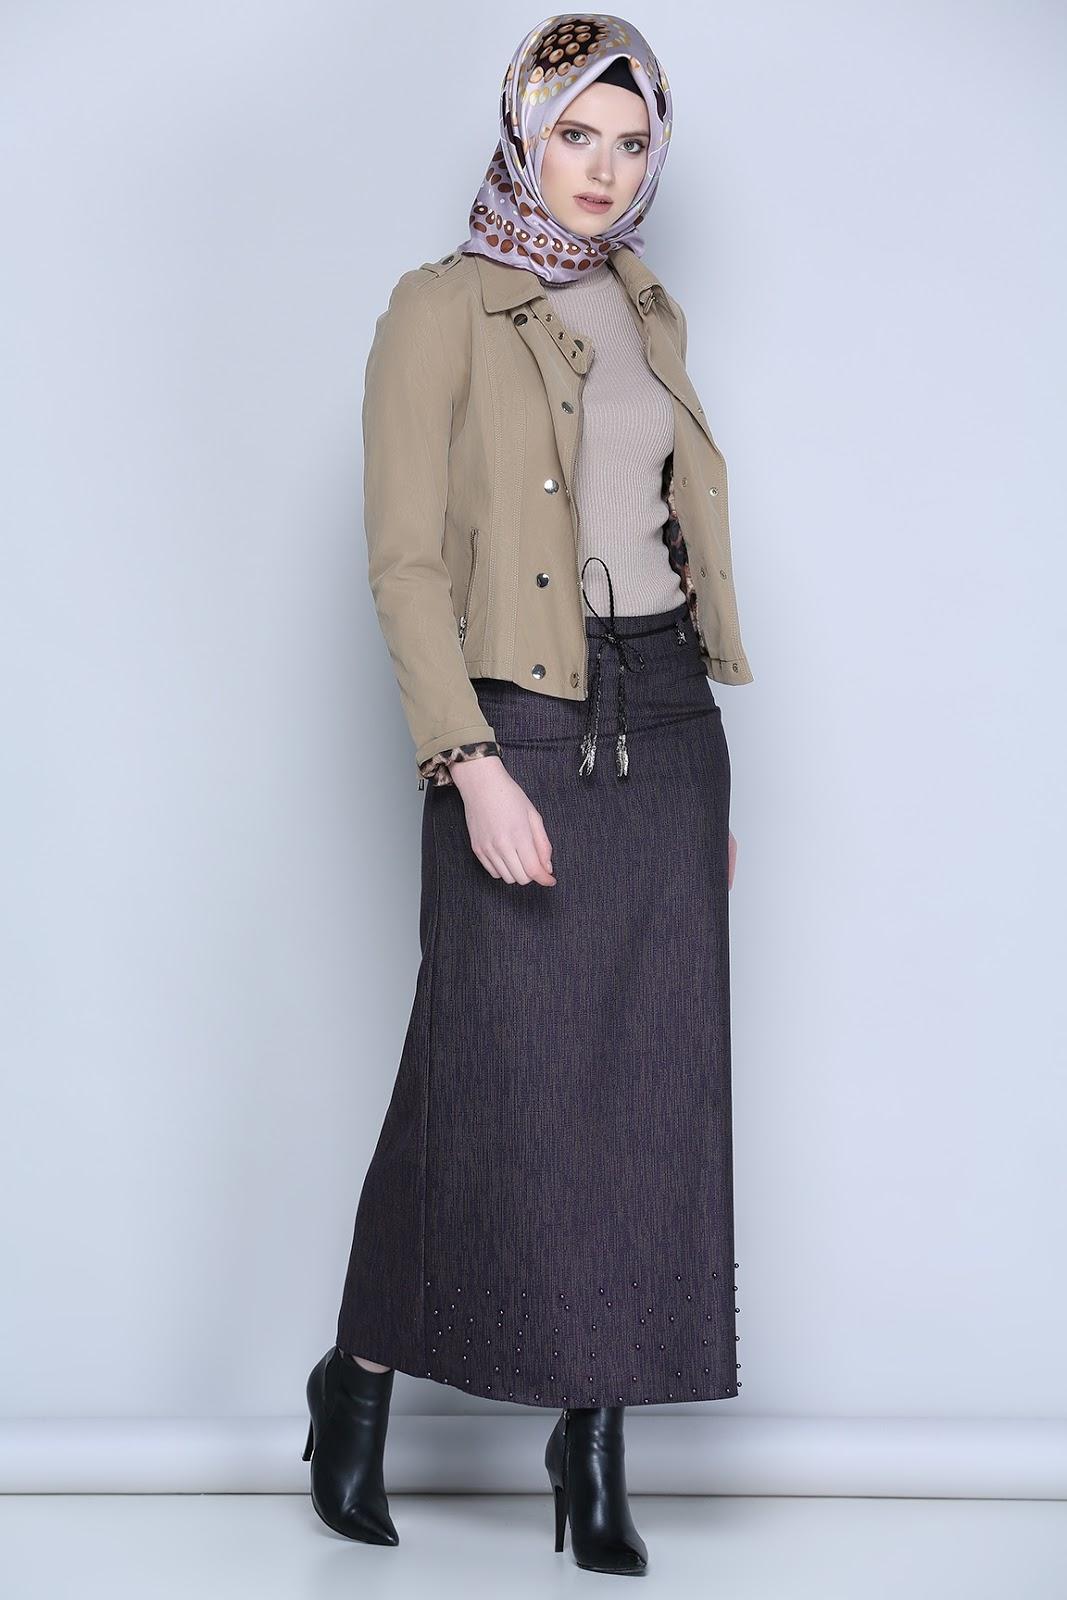 Hijab Chic Style Hiver Avec Robe Hijab Fashion And Chic